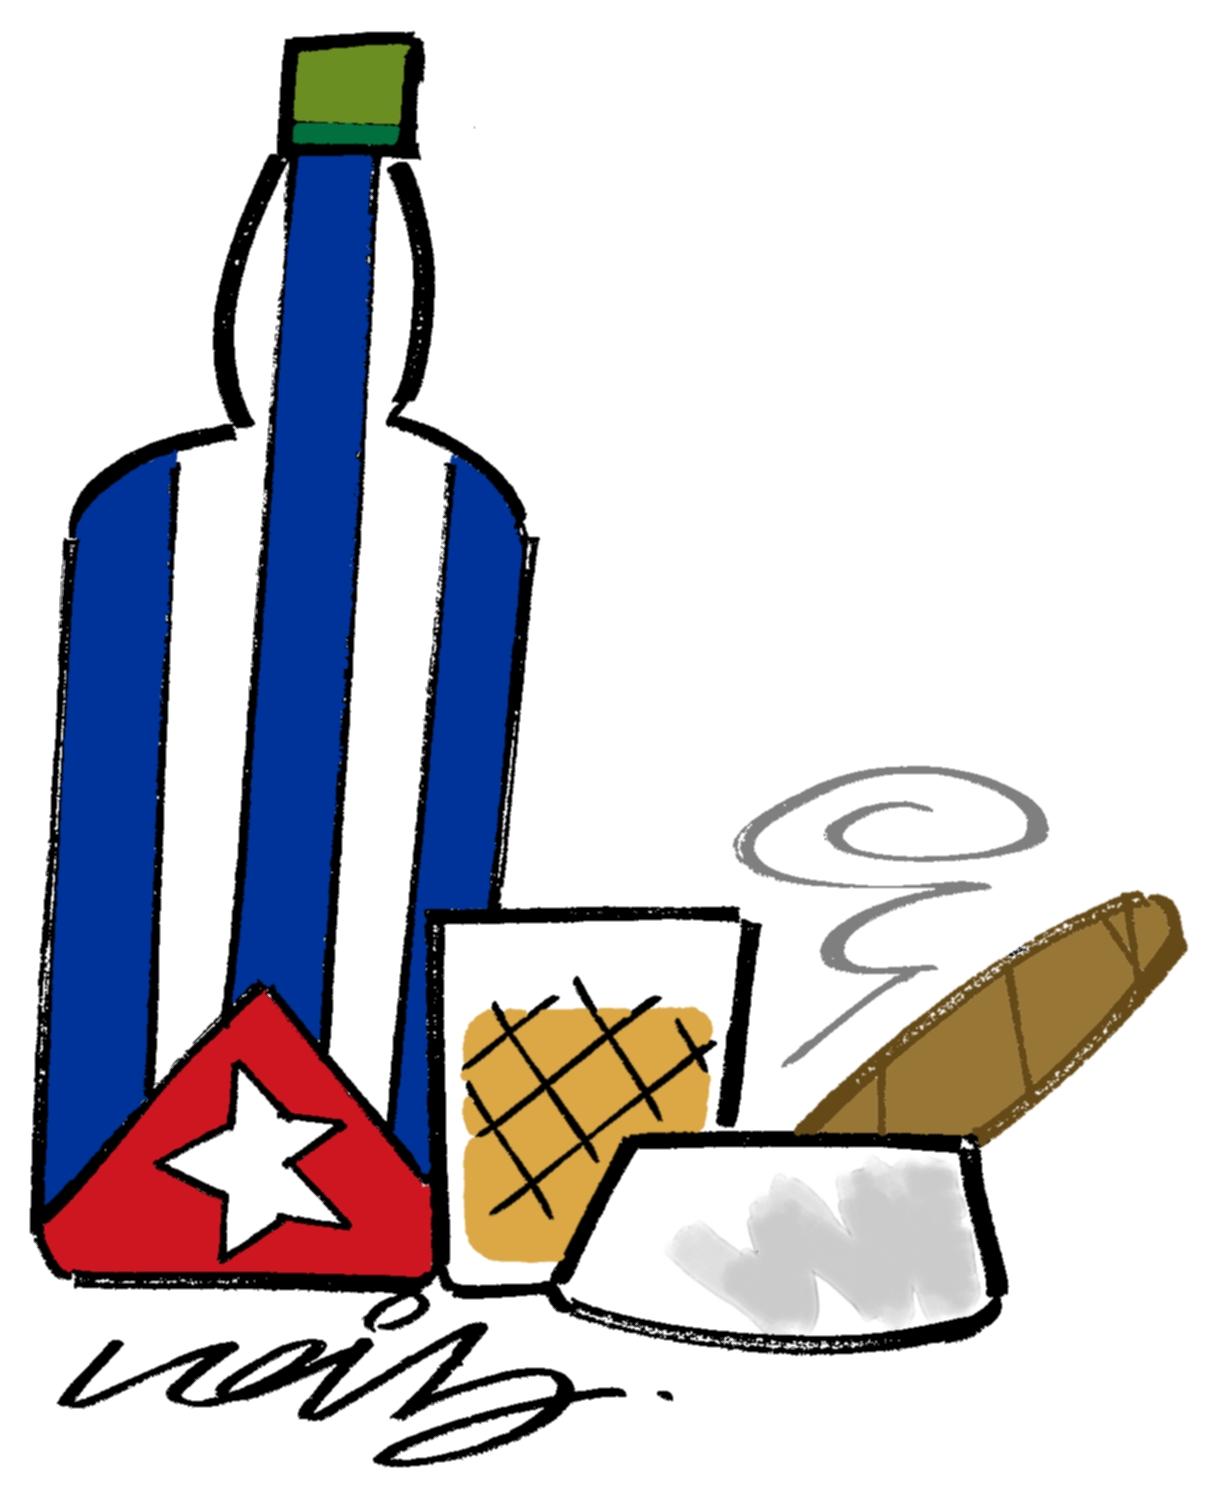 Cuban Cigar cartoon - Whisky and cigars